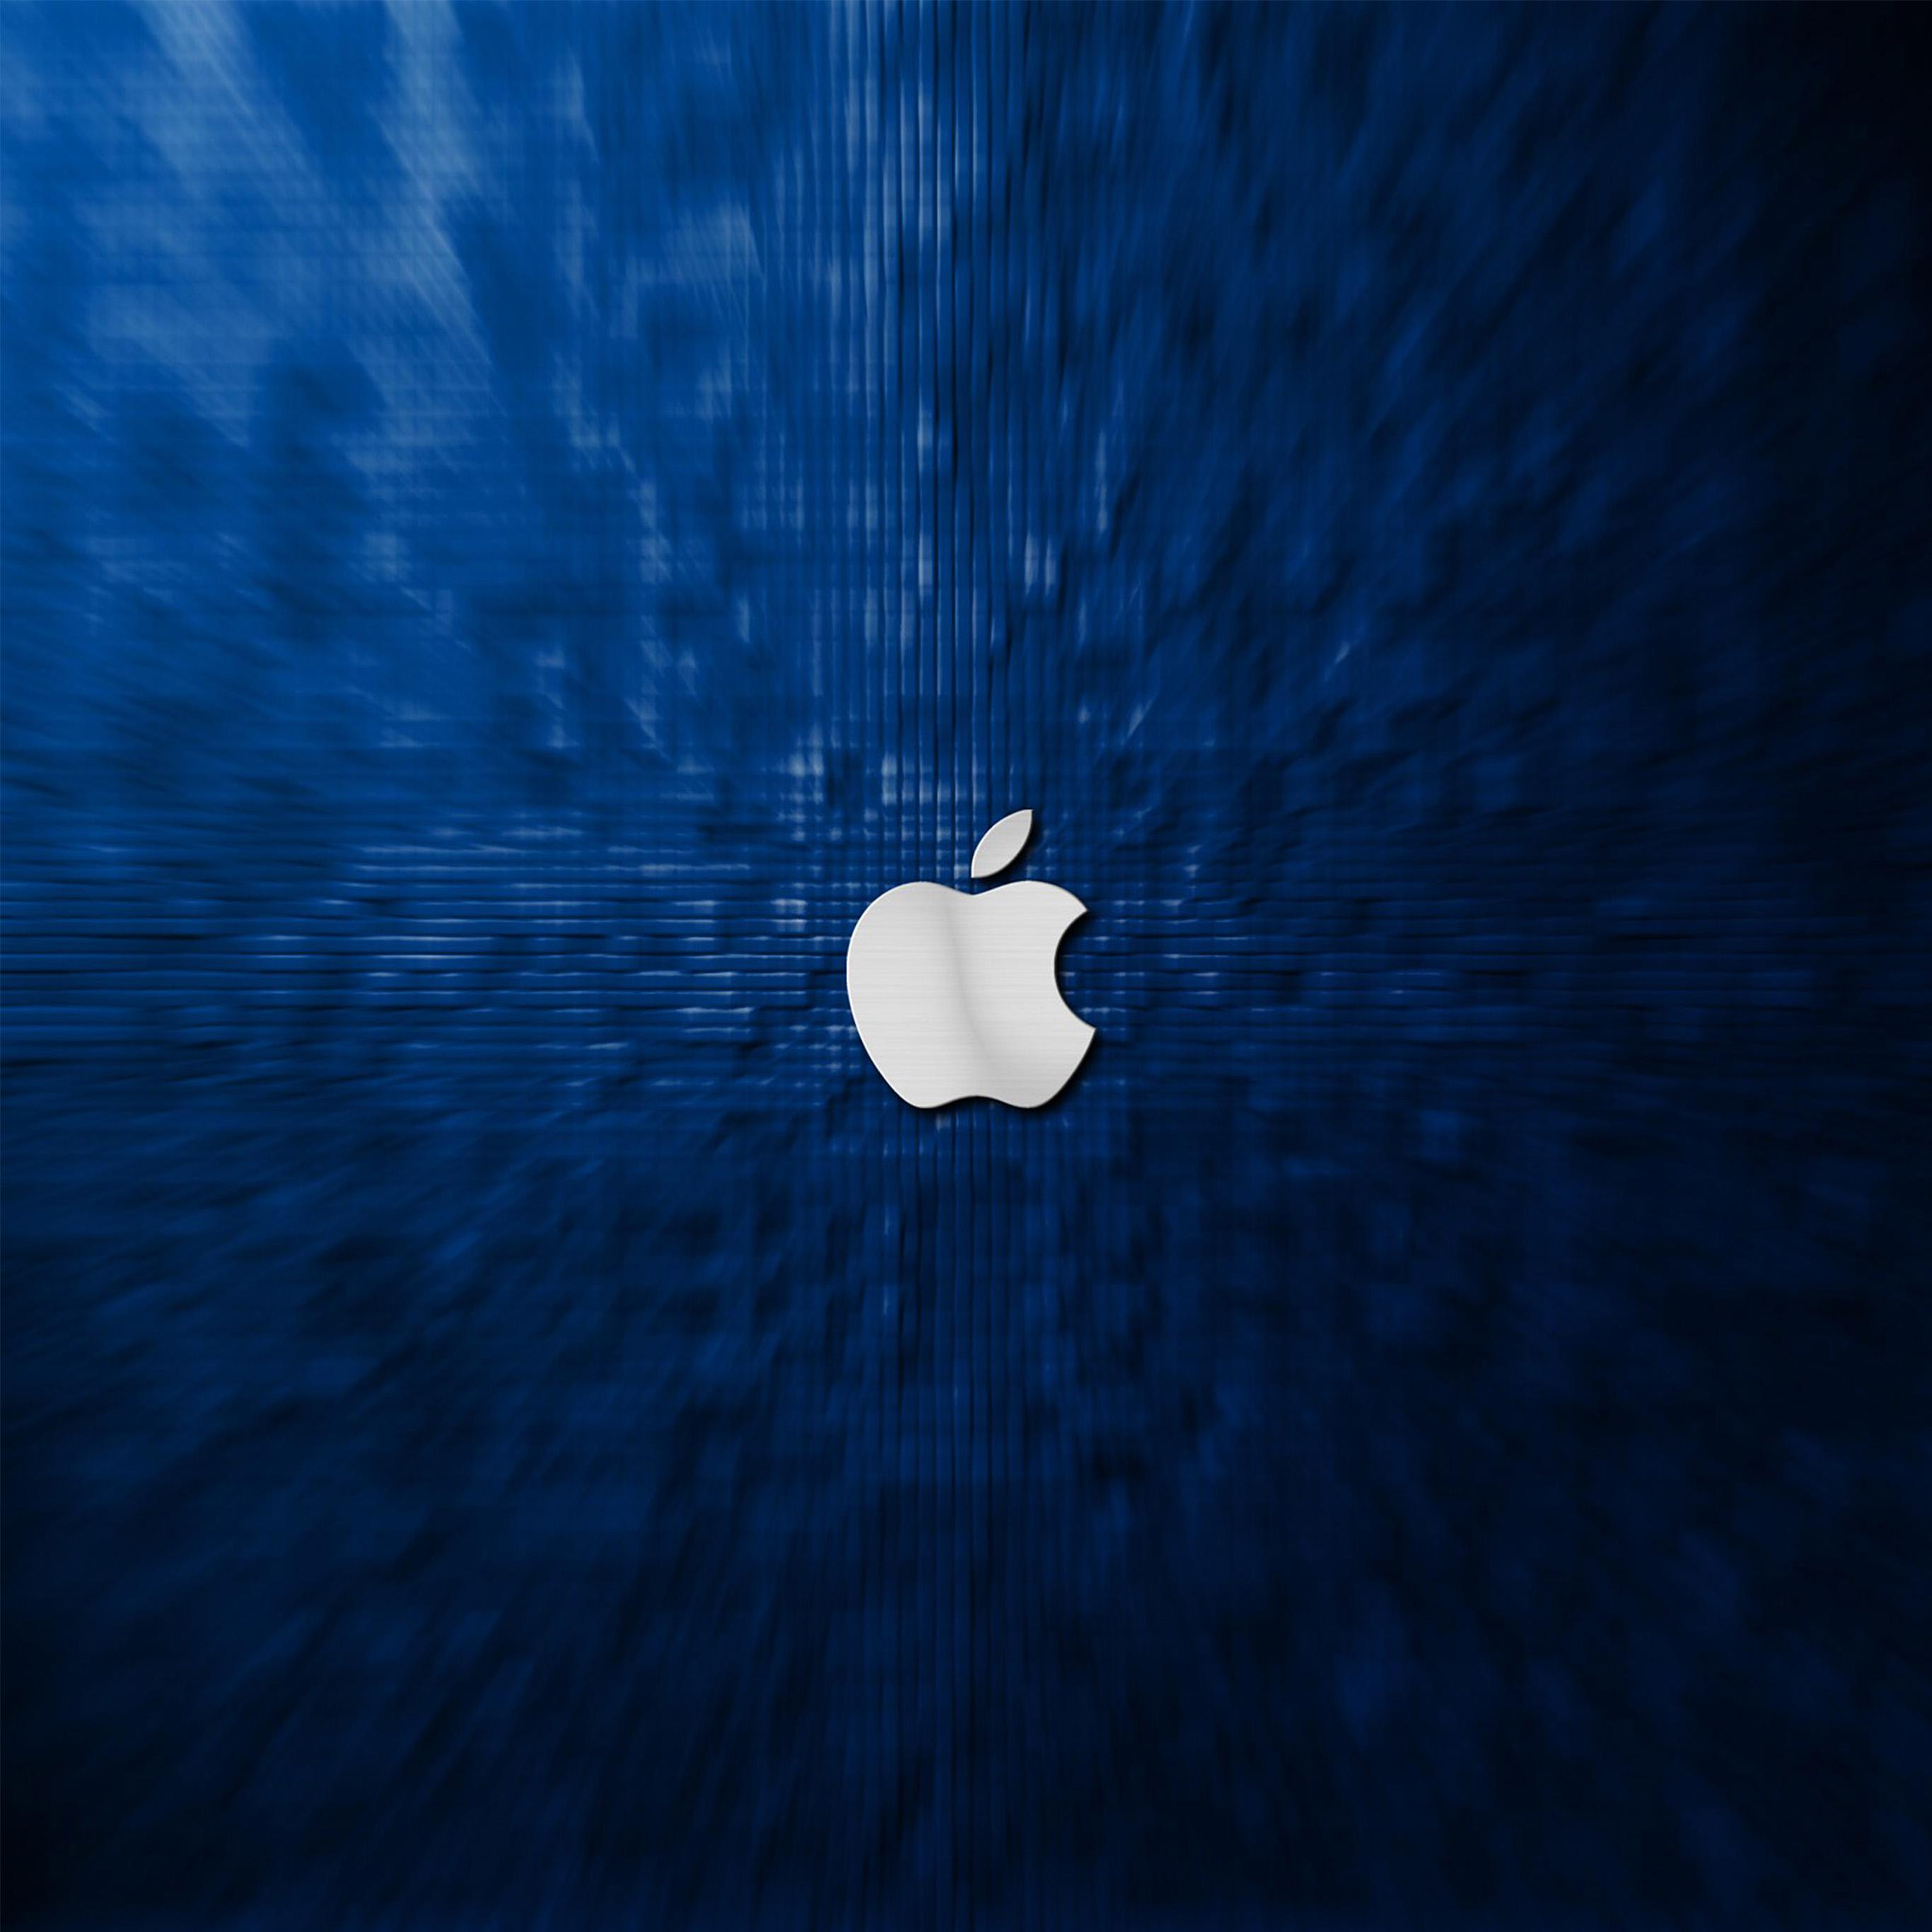 Wallpapers For Mac Hd: [50+] IPad Pro HD Wallpaper On WallpaperSafari